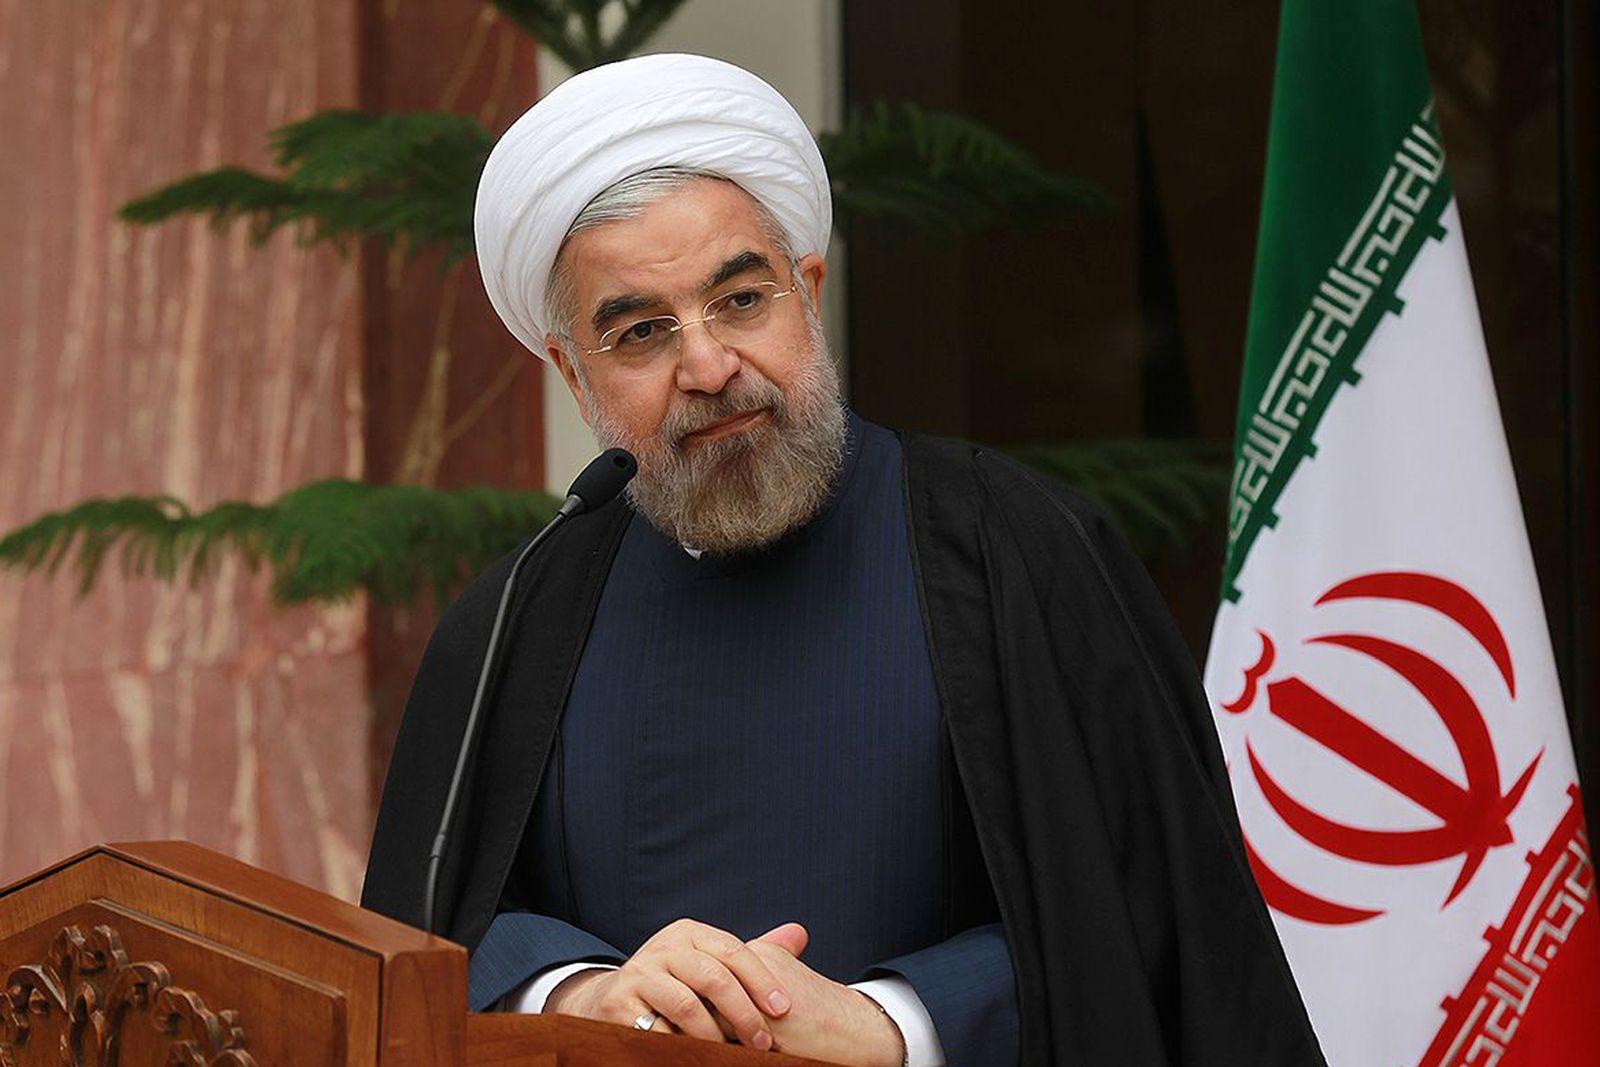 IRAN-NUCLEAR-POLITICS-ROUHANI